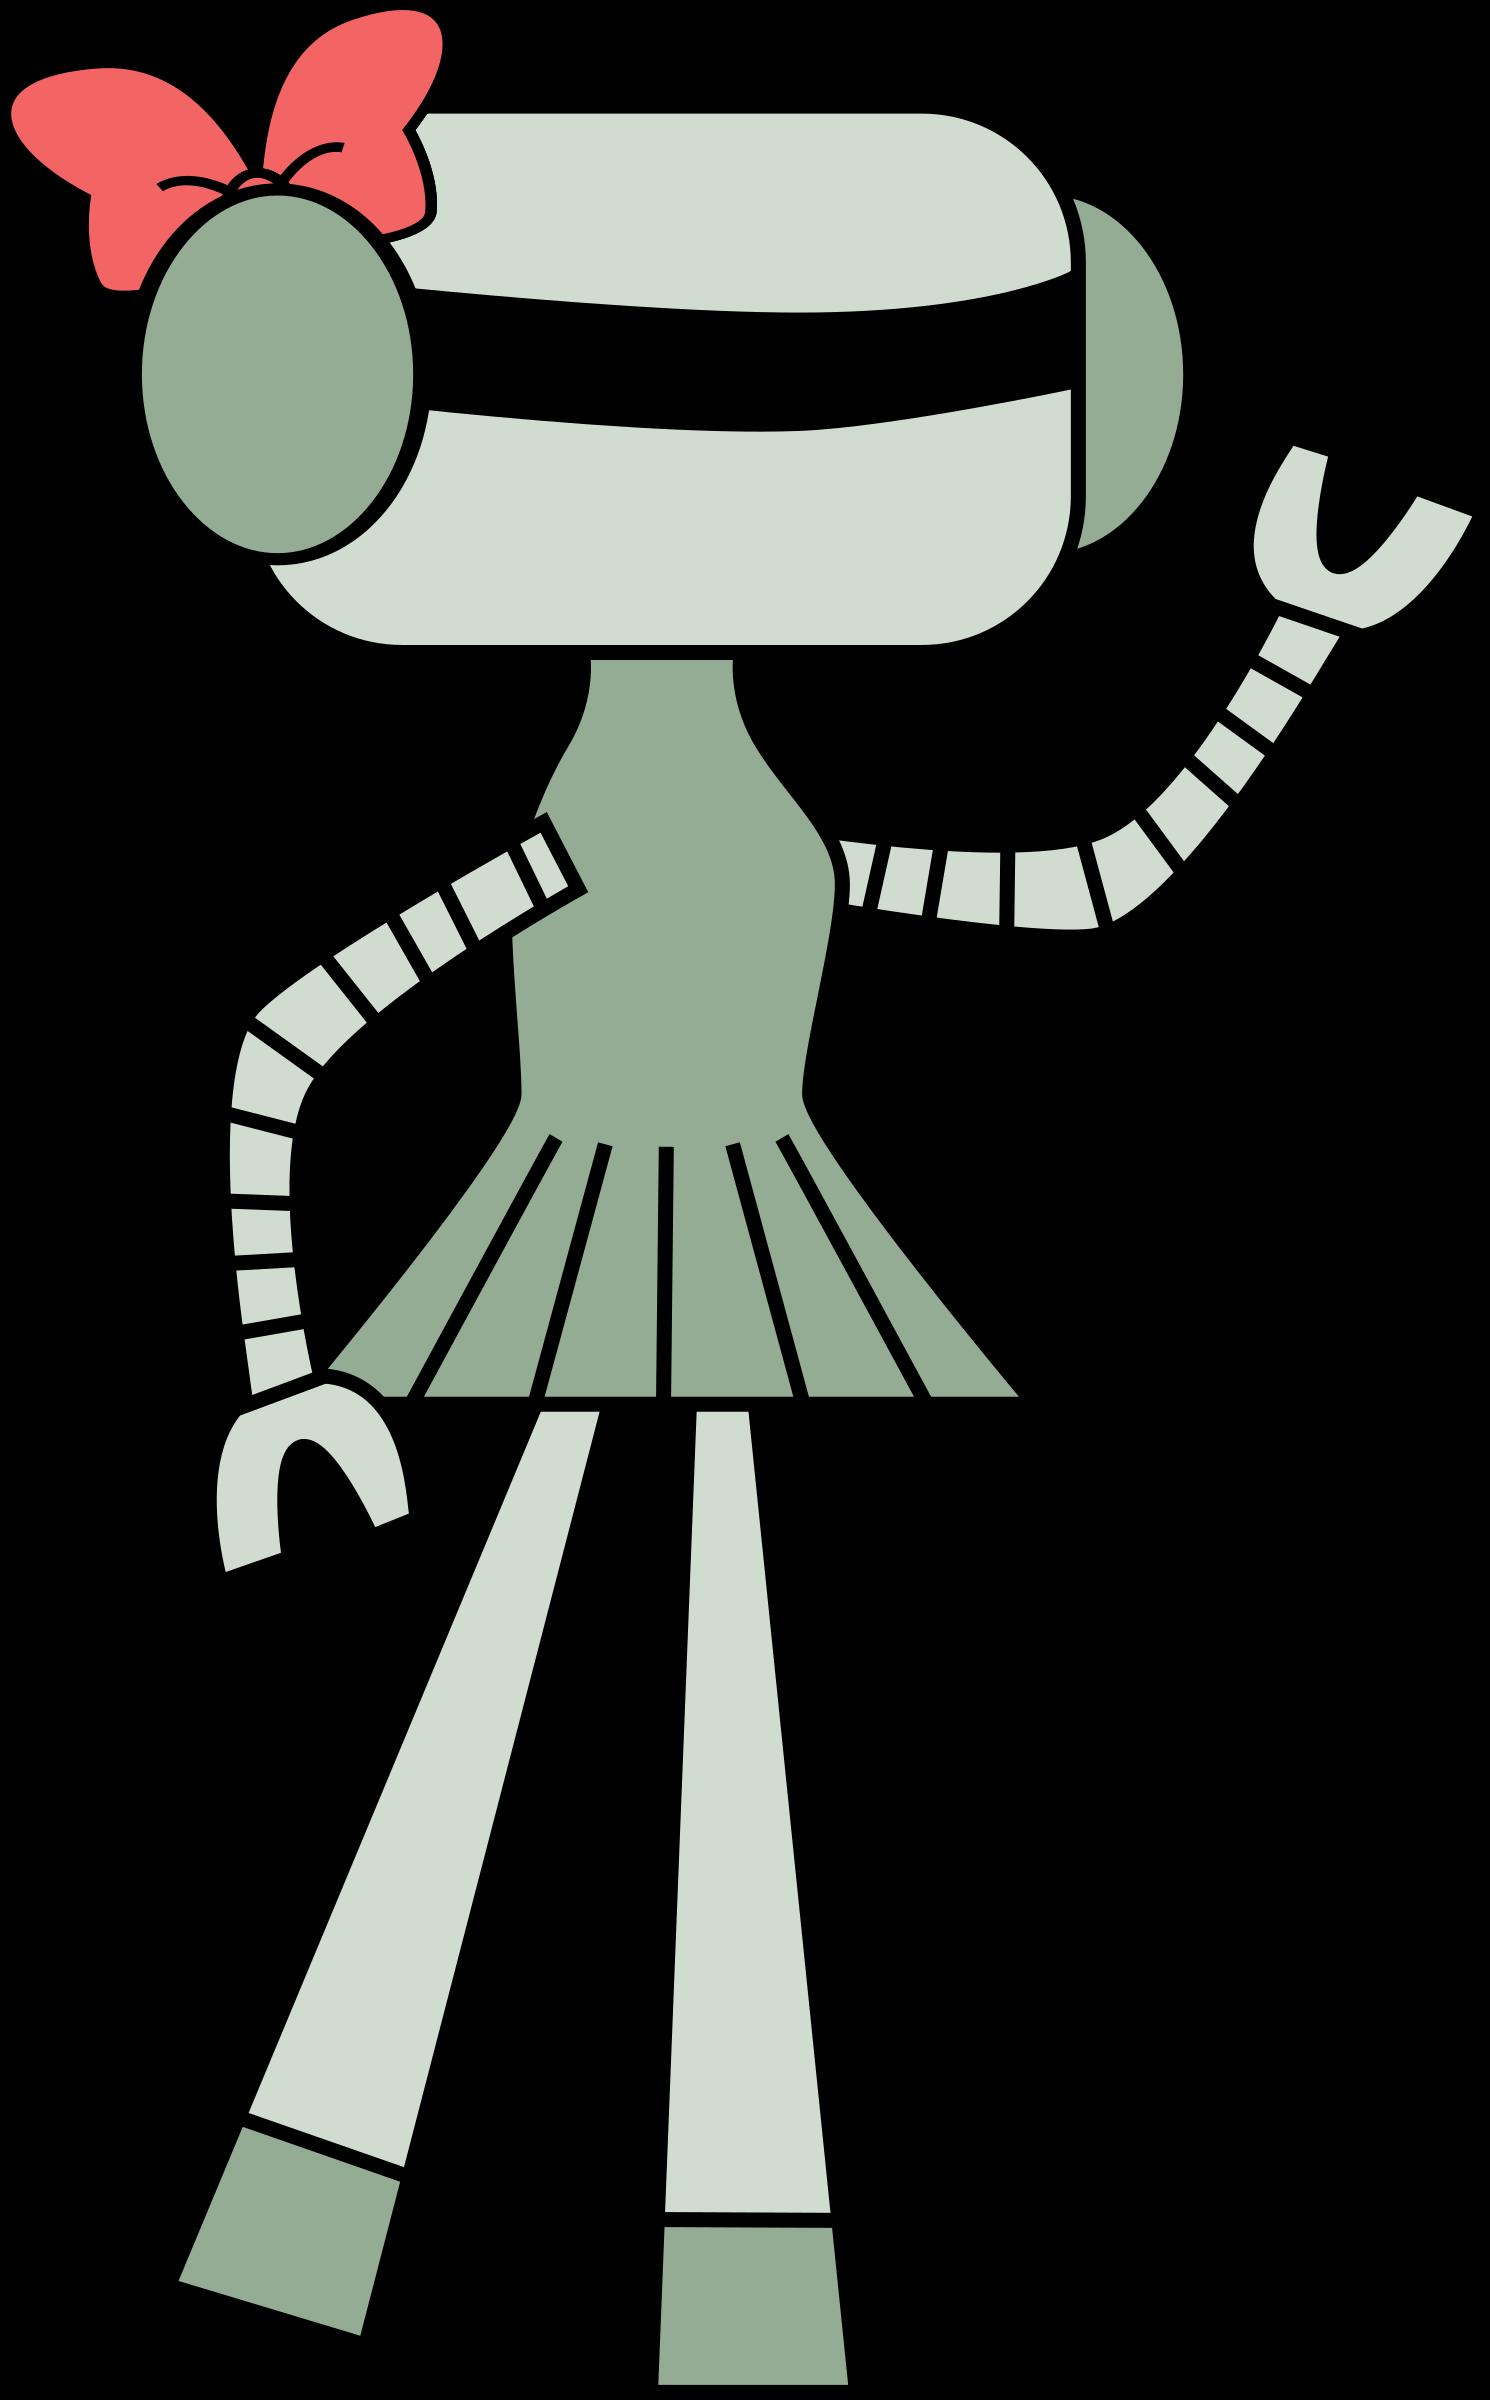 Robot clipart female #6